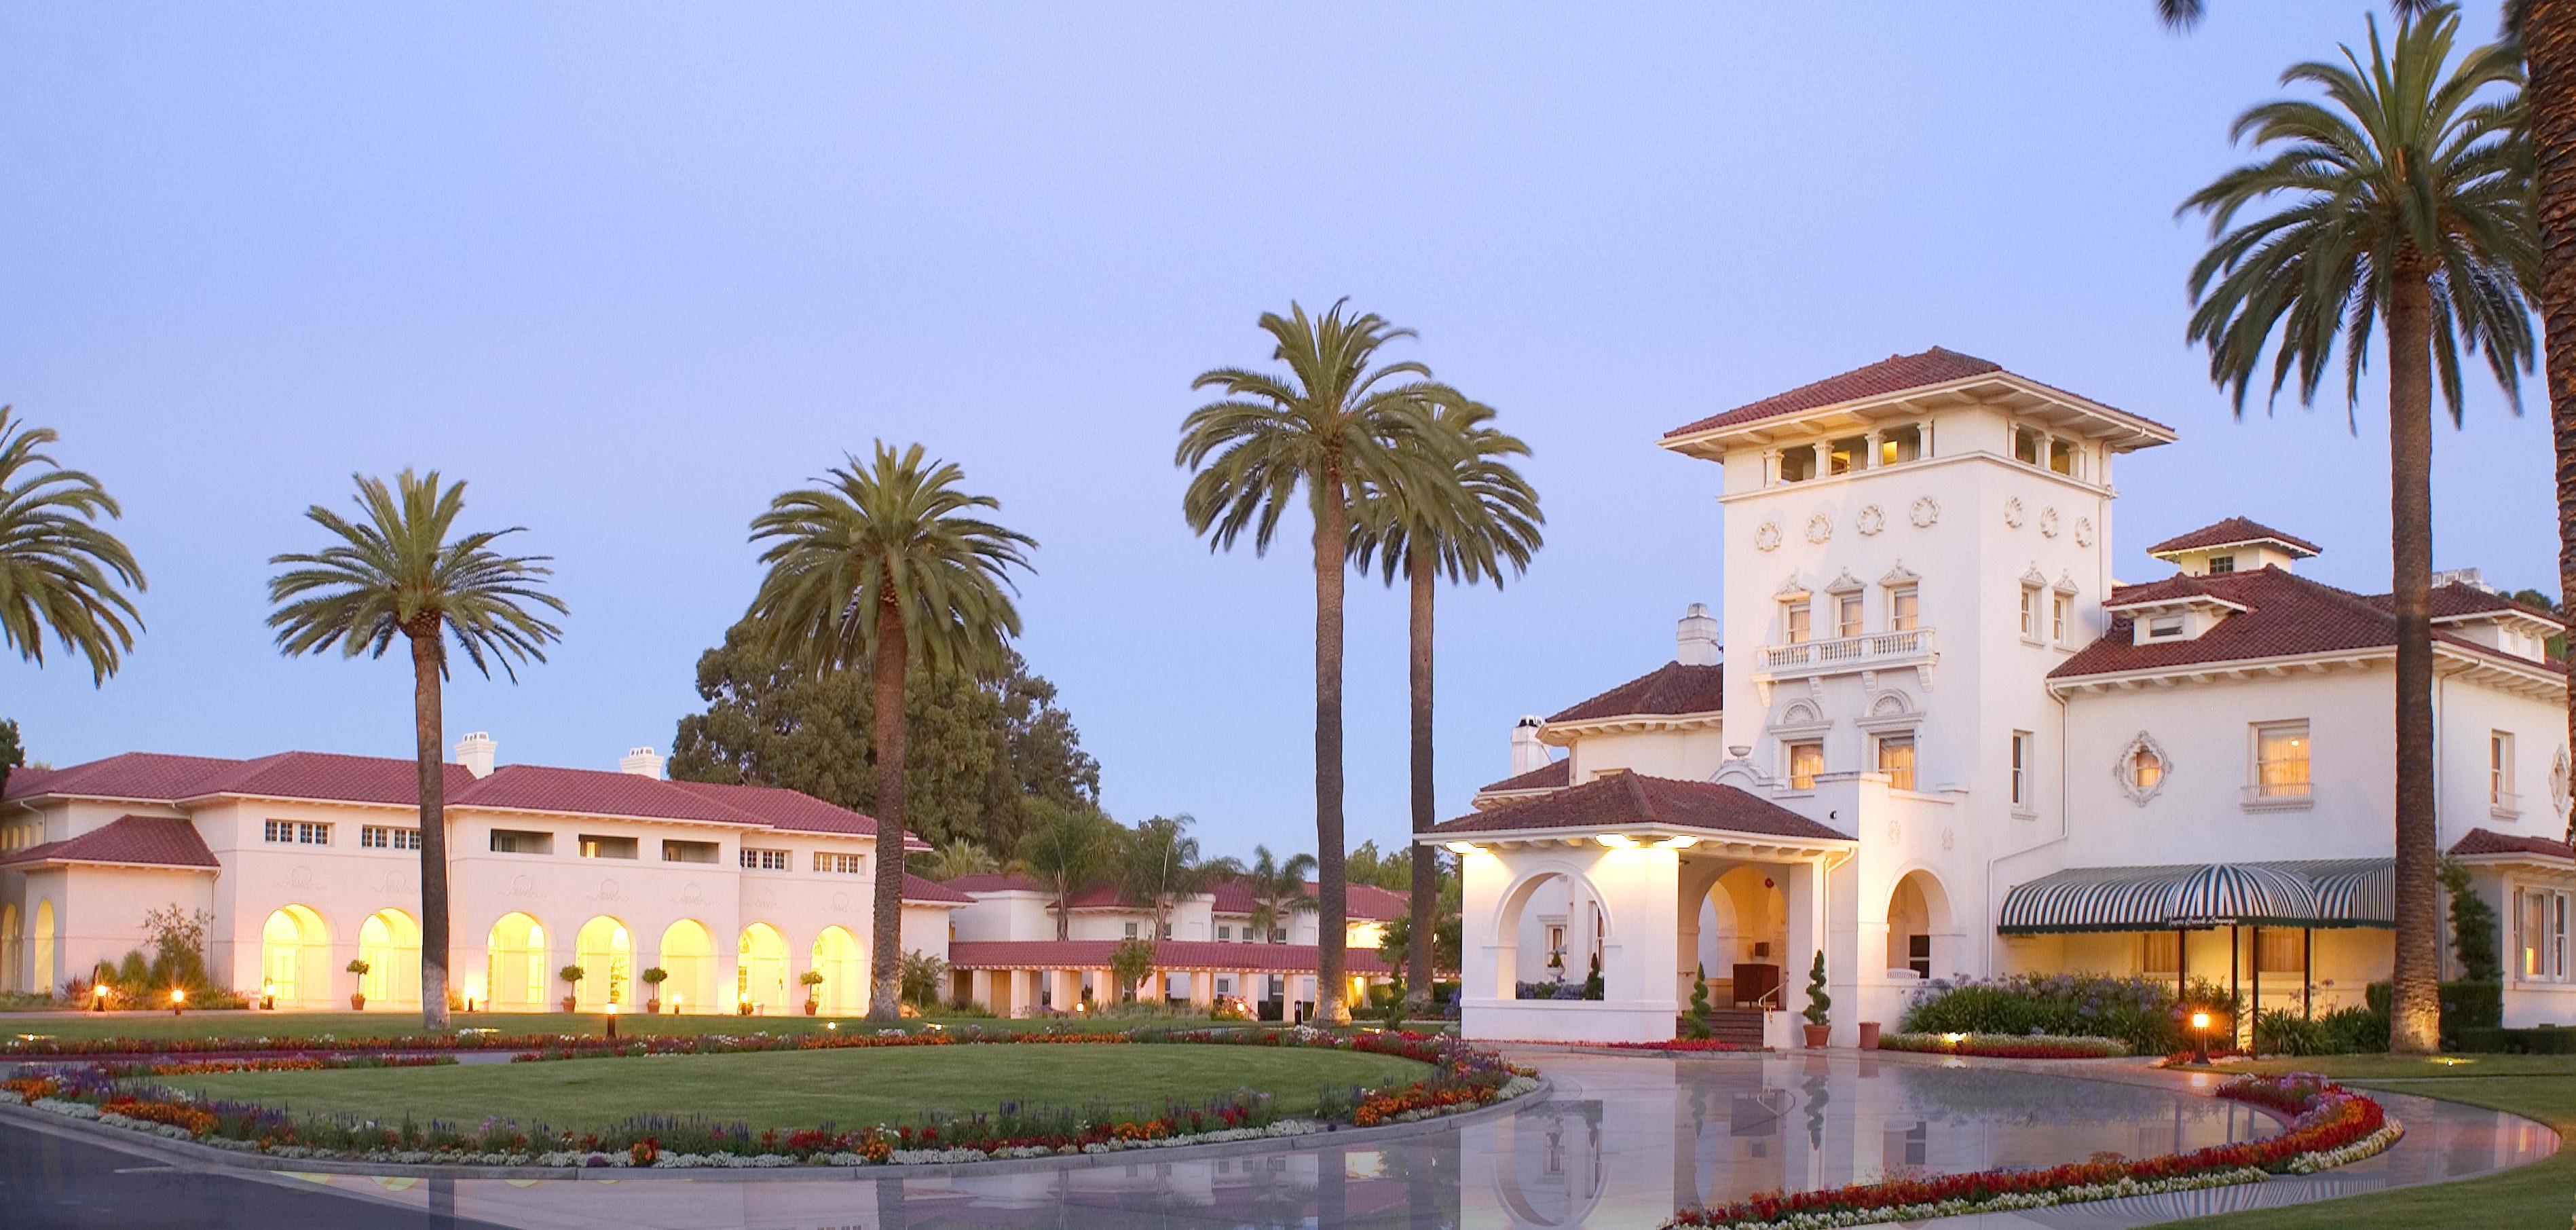 Dating Σαν Χοσέ Καλιφόρνια online dating Τούλσα